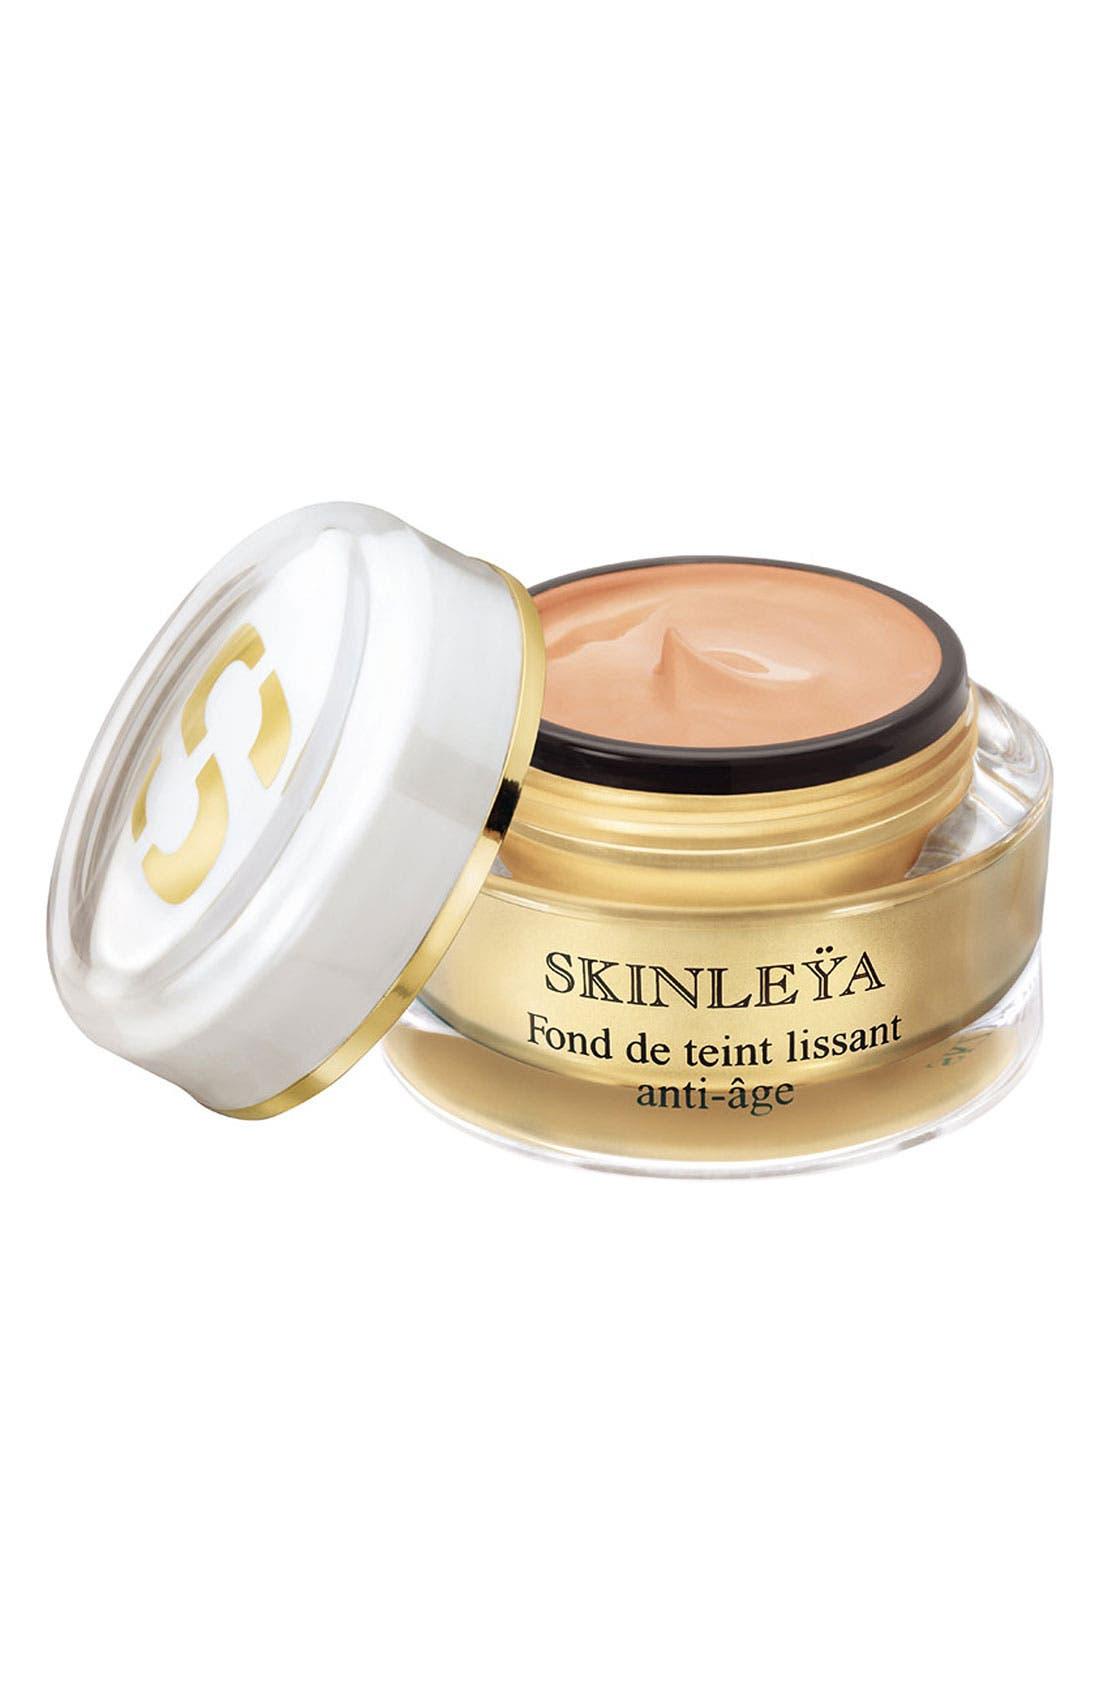 Skinleÿa Anti-Aging Foundation,                         Main,                         color,